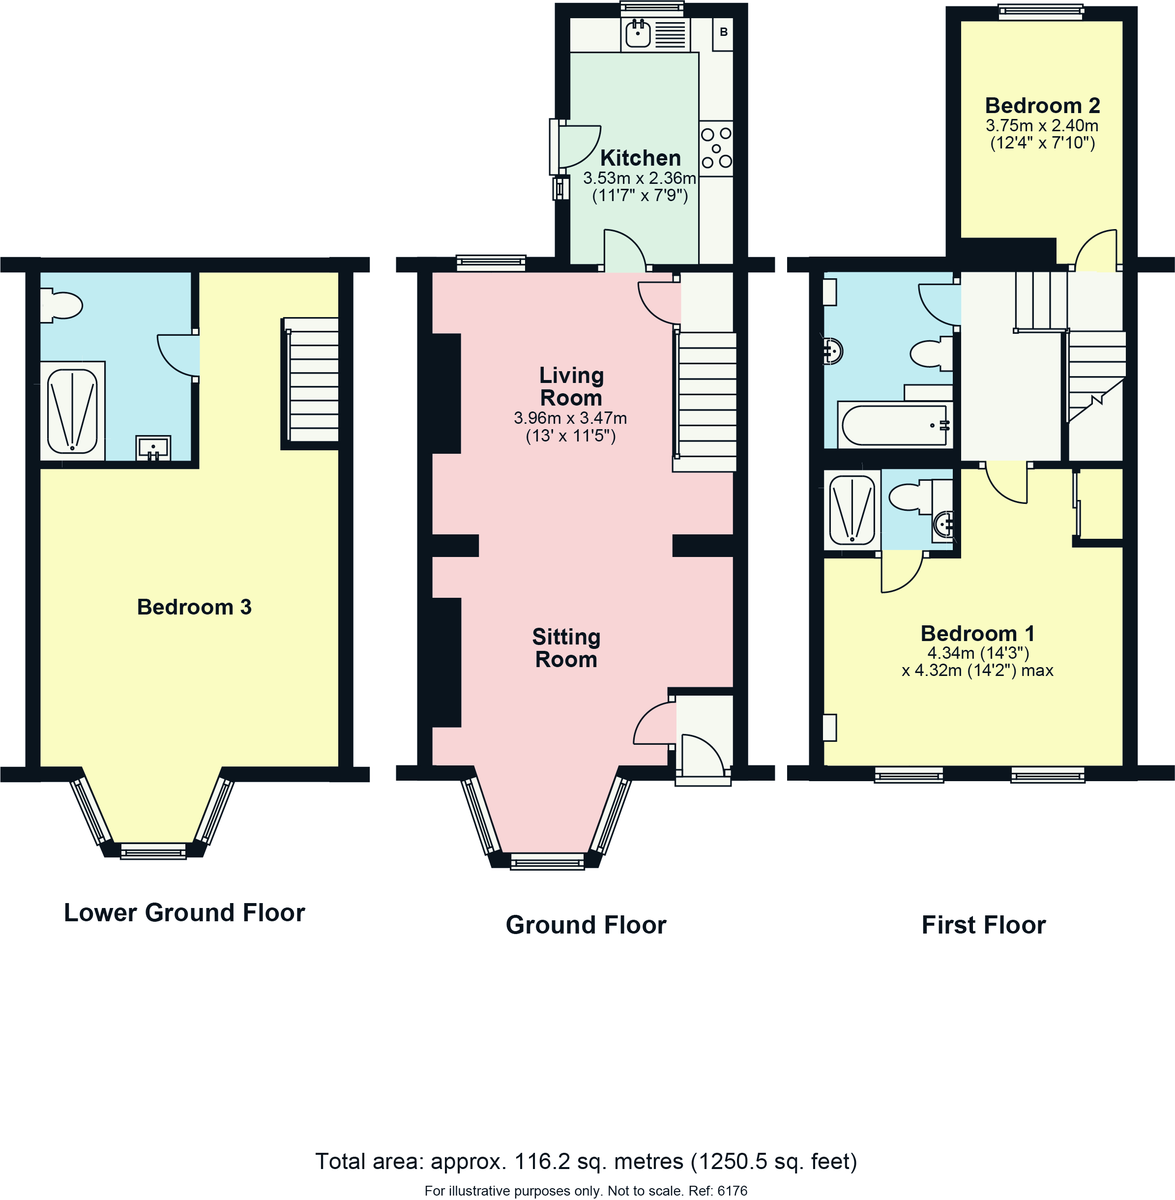 Floorplan 56 Aynam Road, Kendal, Cumbria, LA9 7DW